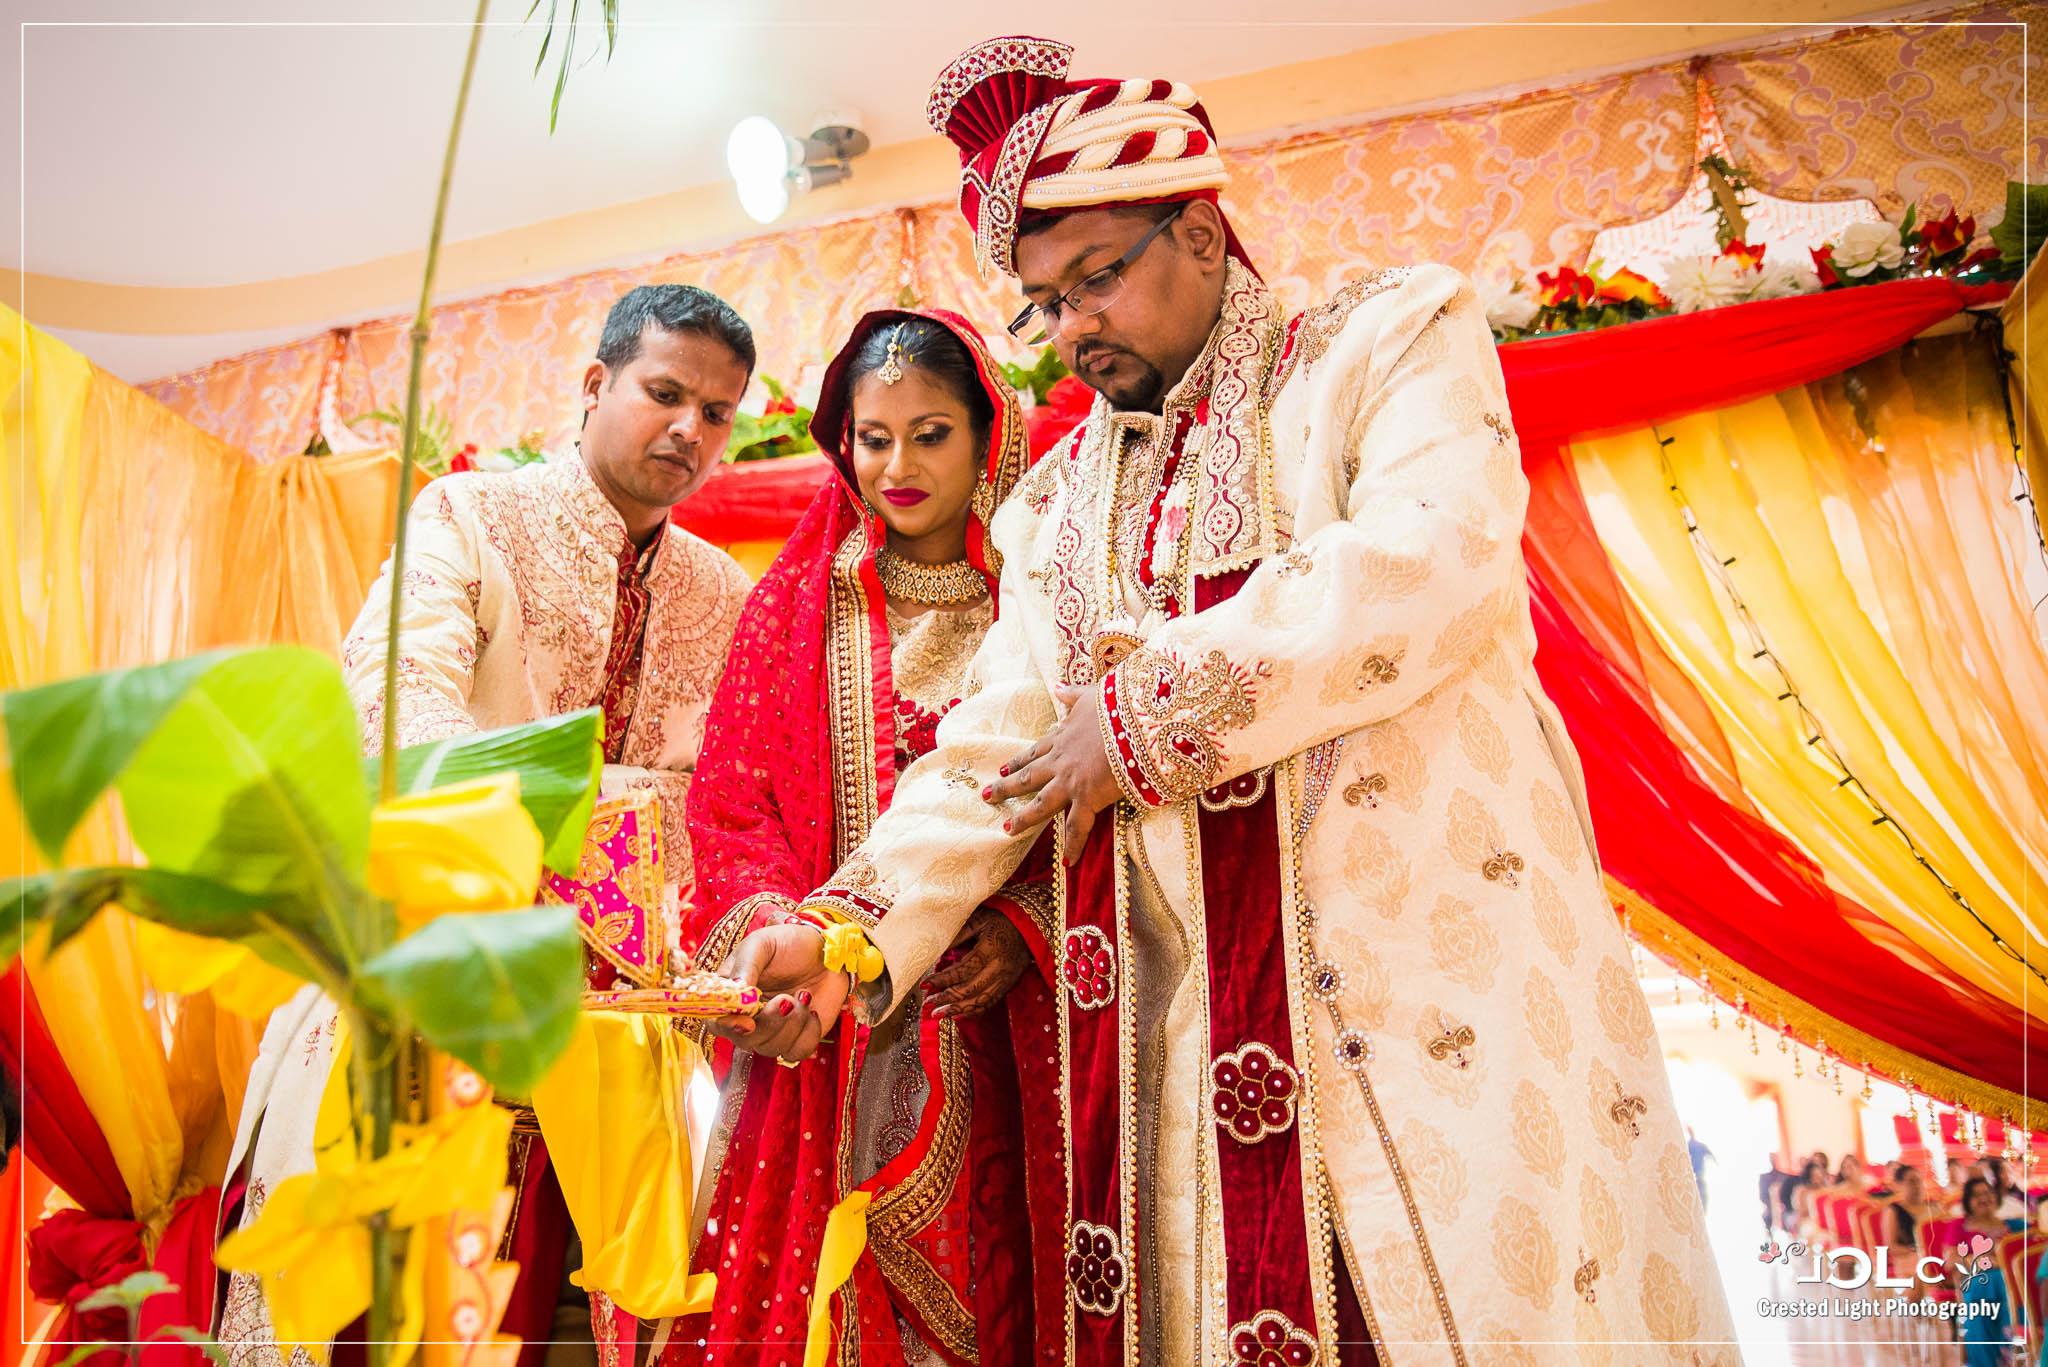 Devi mandir Trinidad Hindu wedding 25.jpg